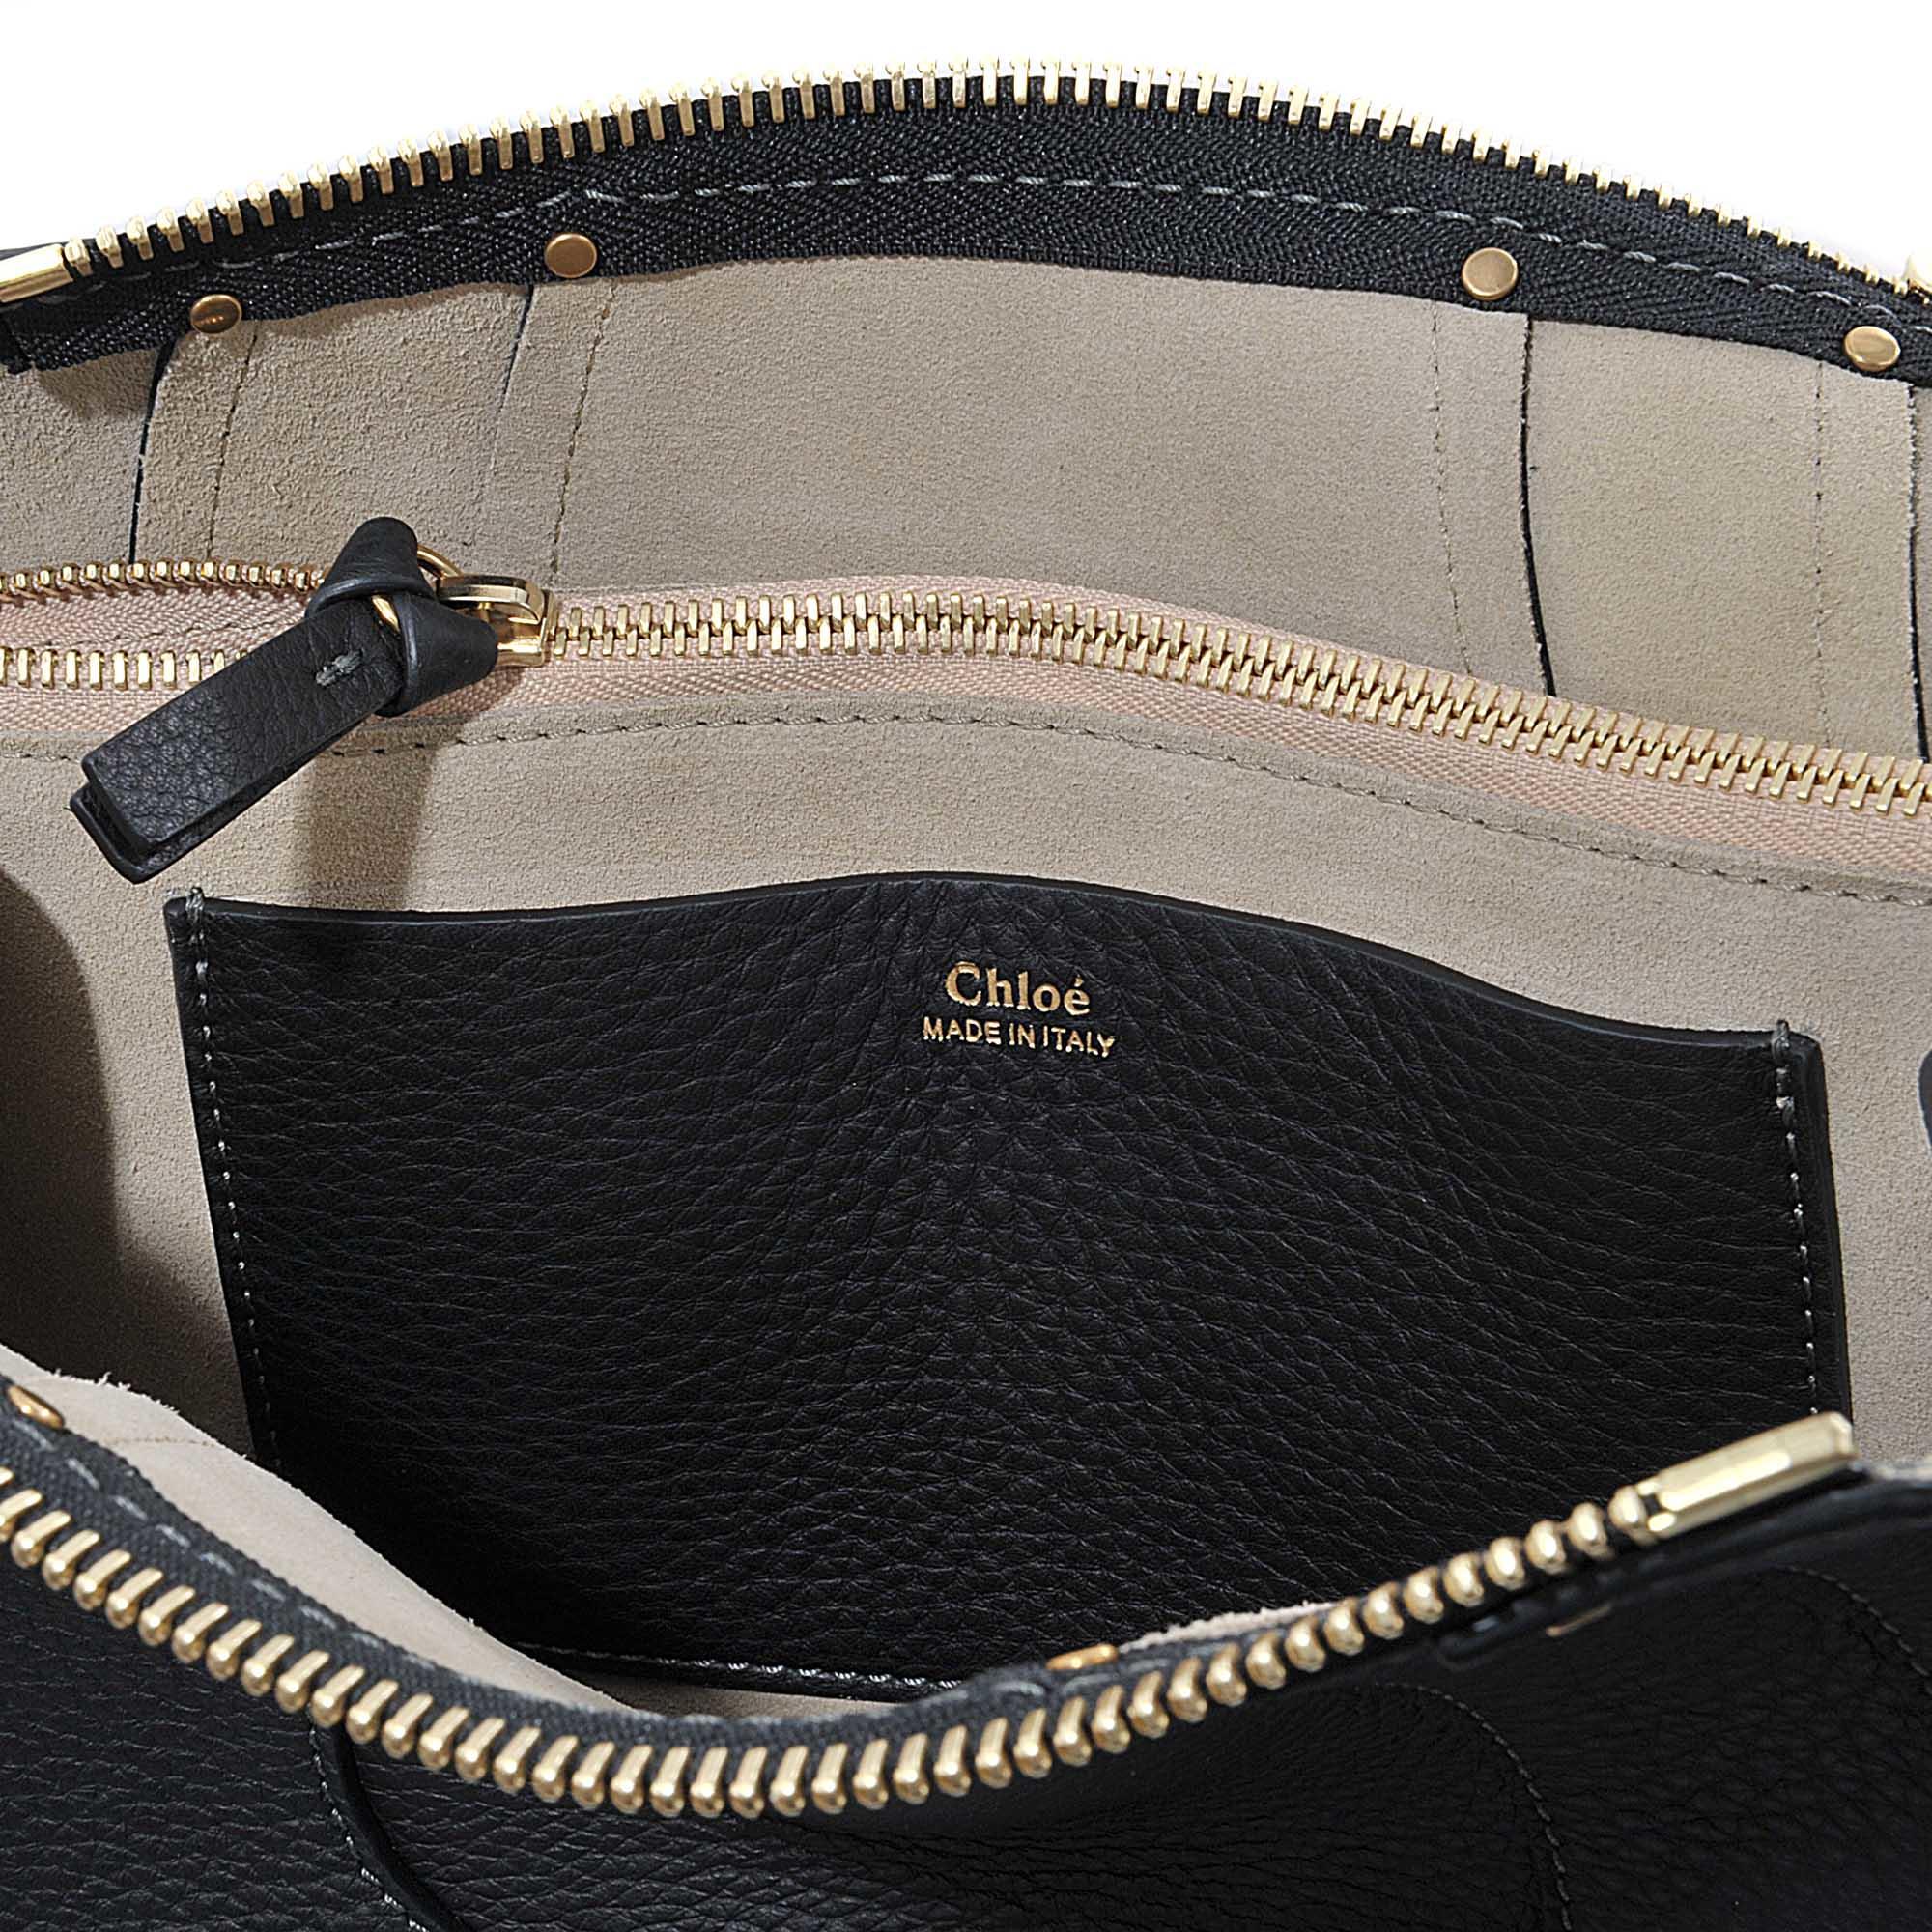 imitation chloe handbags - chloe hayley small hobo, chloe online shopping